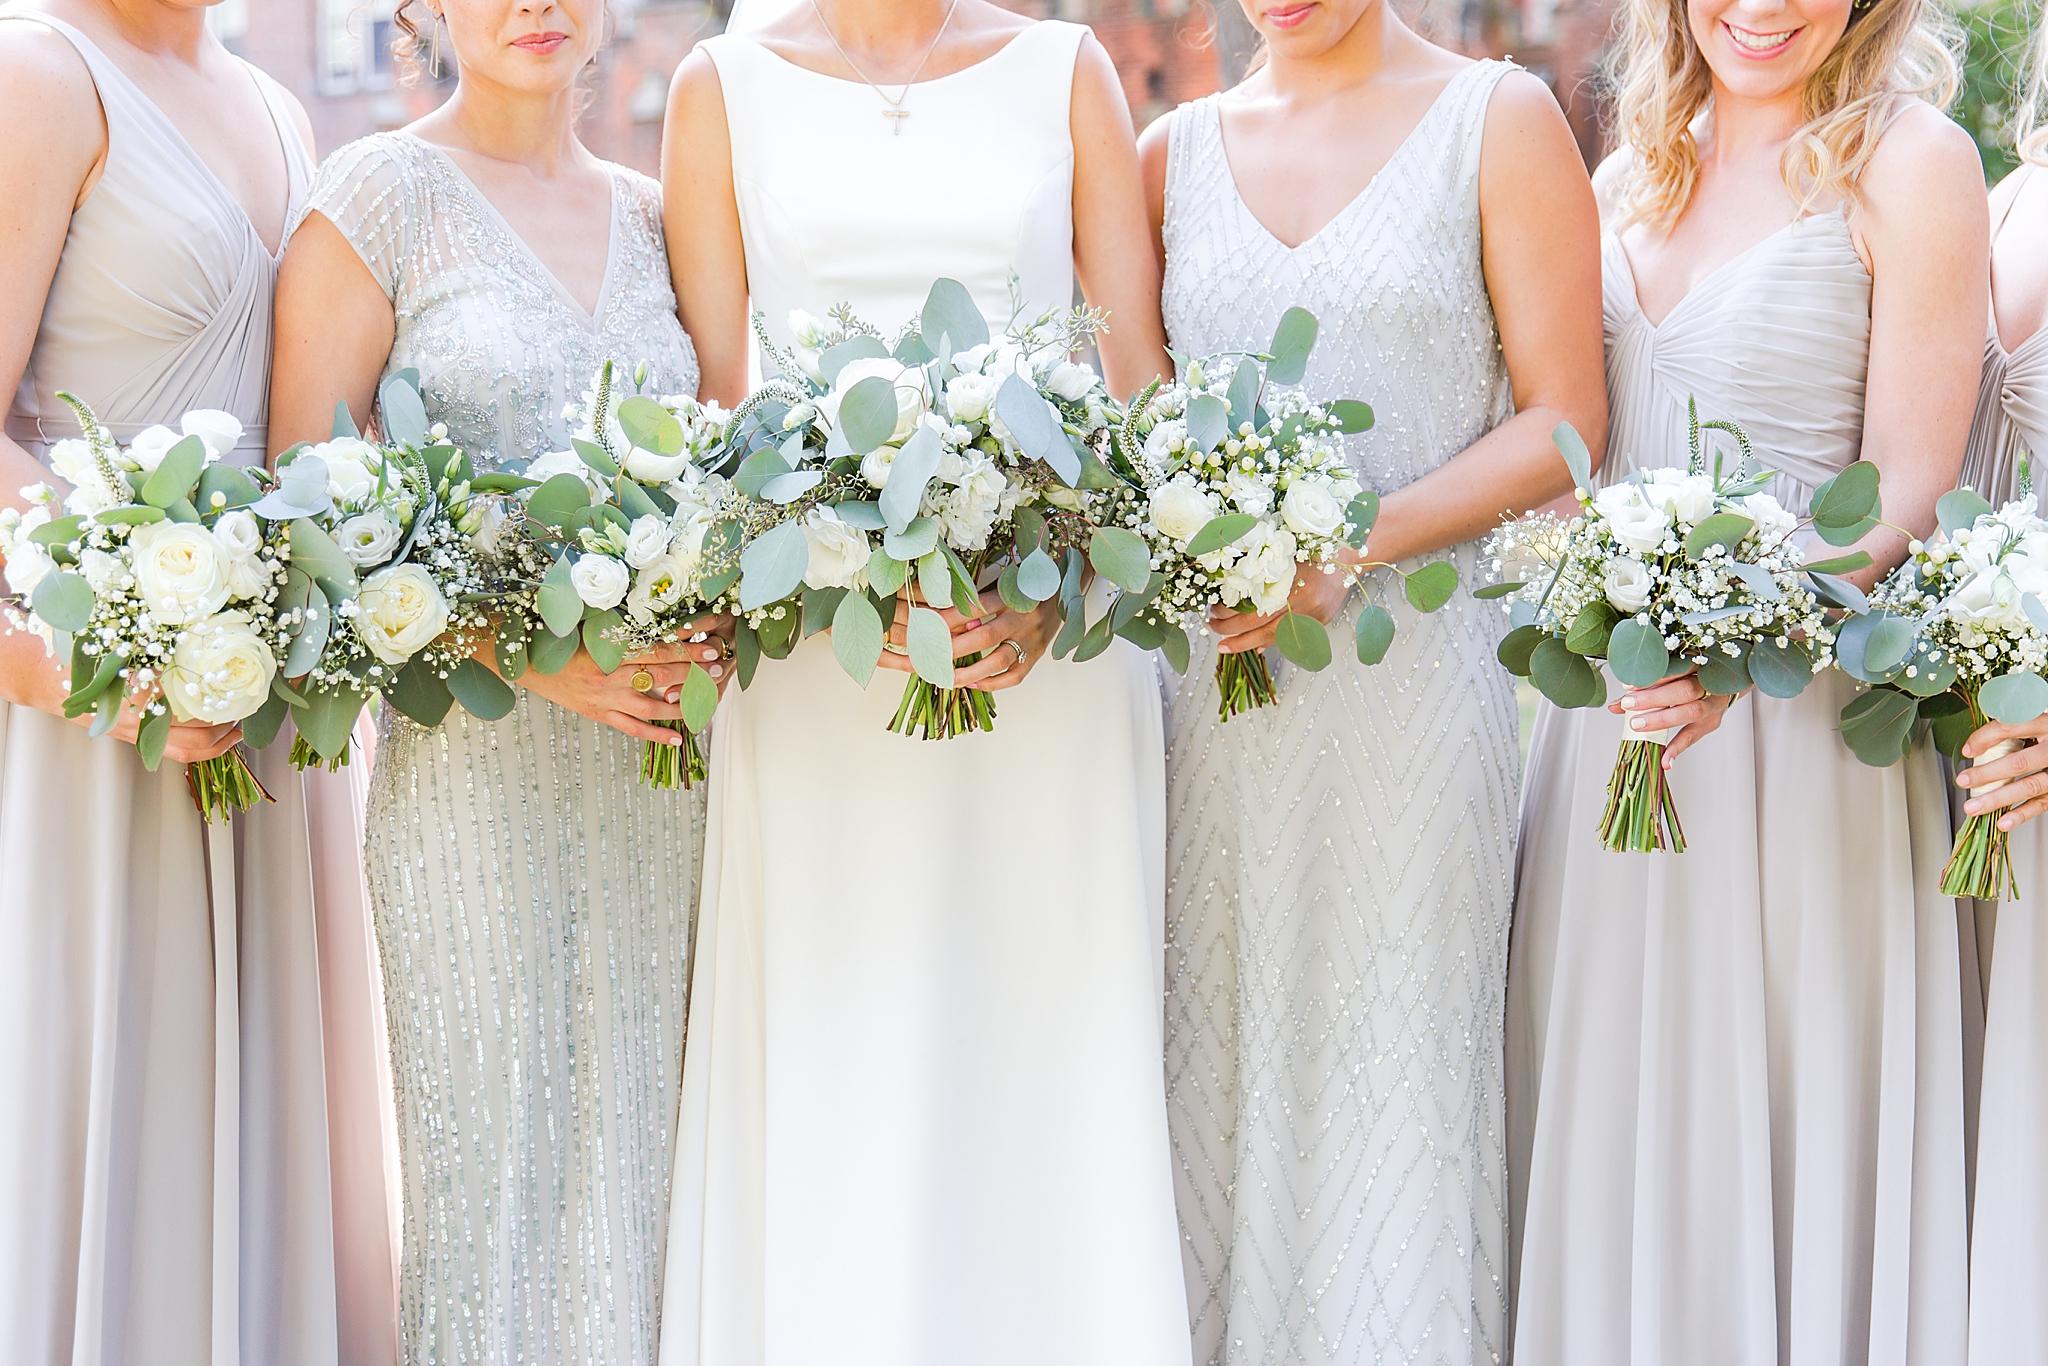 detroit-wedding-photographer-grosse-pointe-academy-chapel-detroit-golf-club-wedding-carly-matt-by-courtney-carolyn-photography_0066.jpg